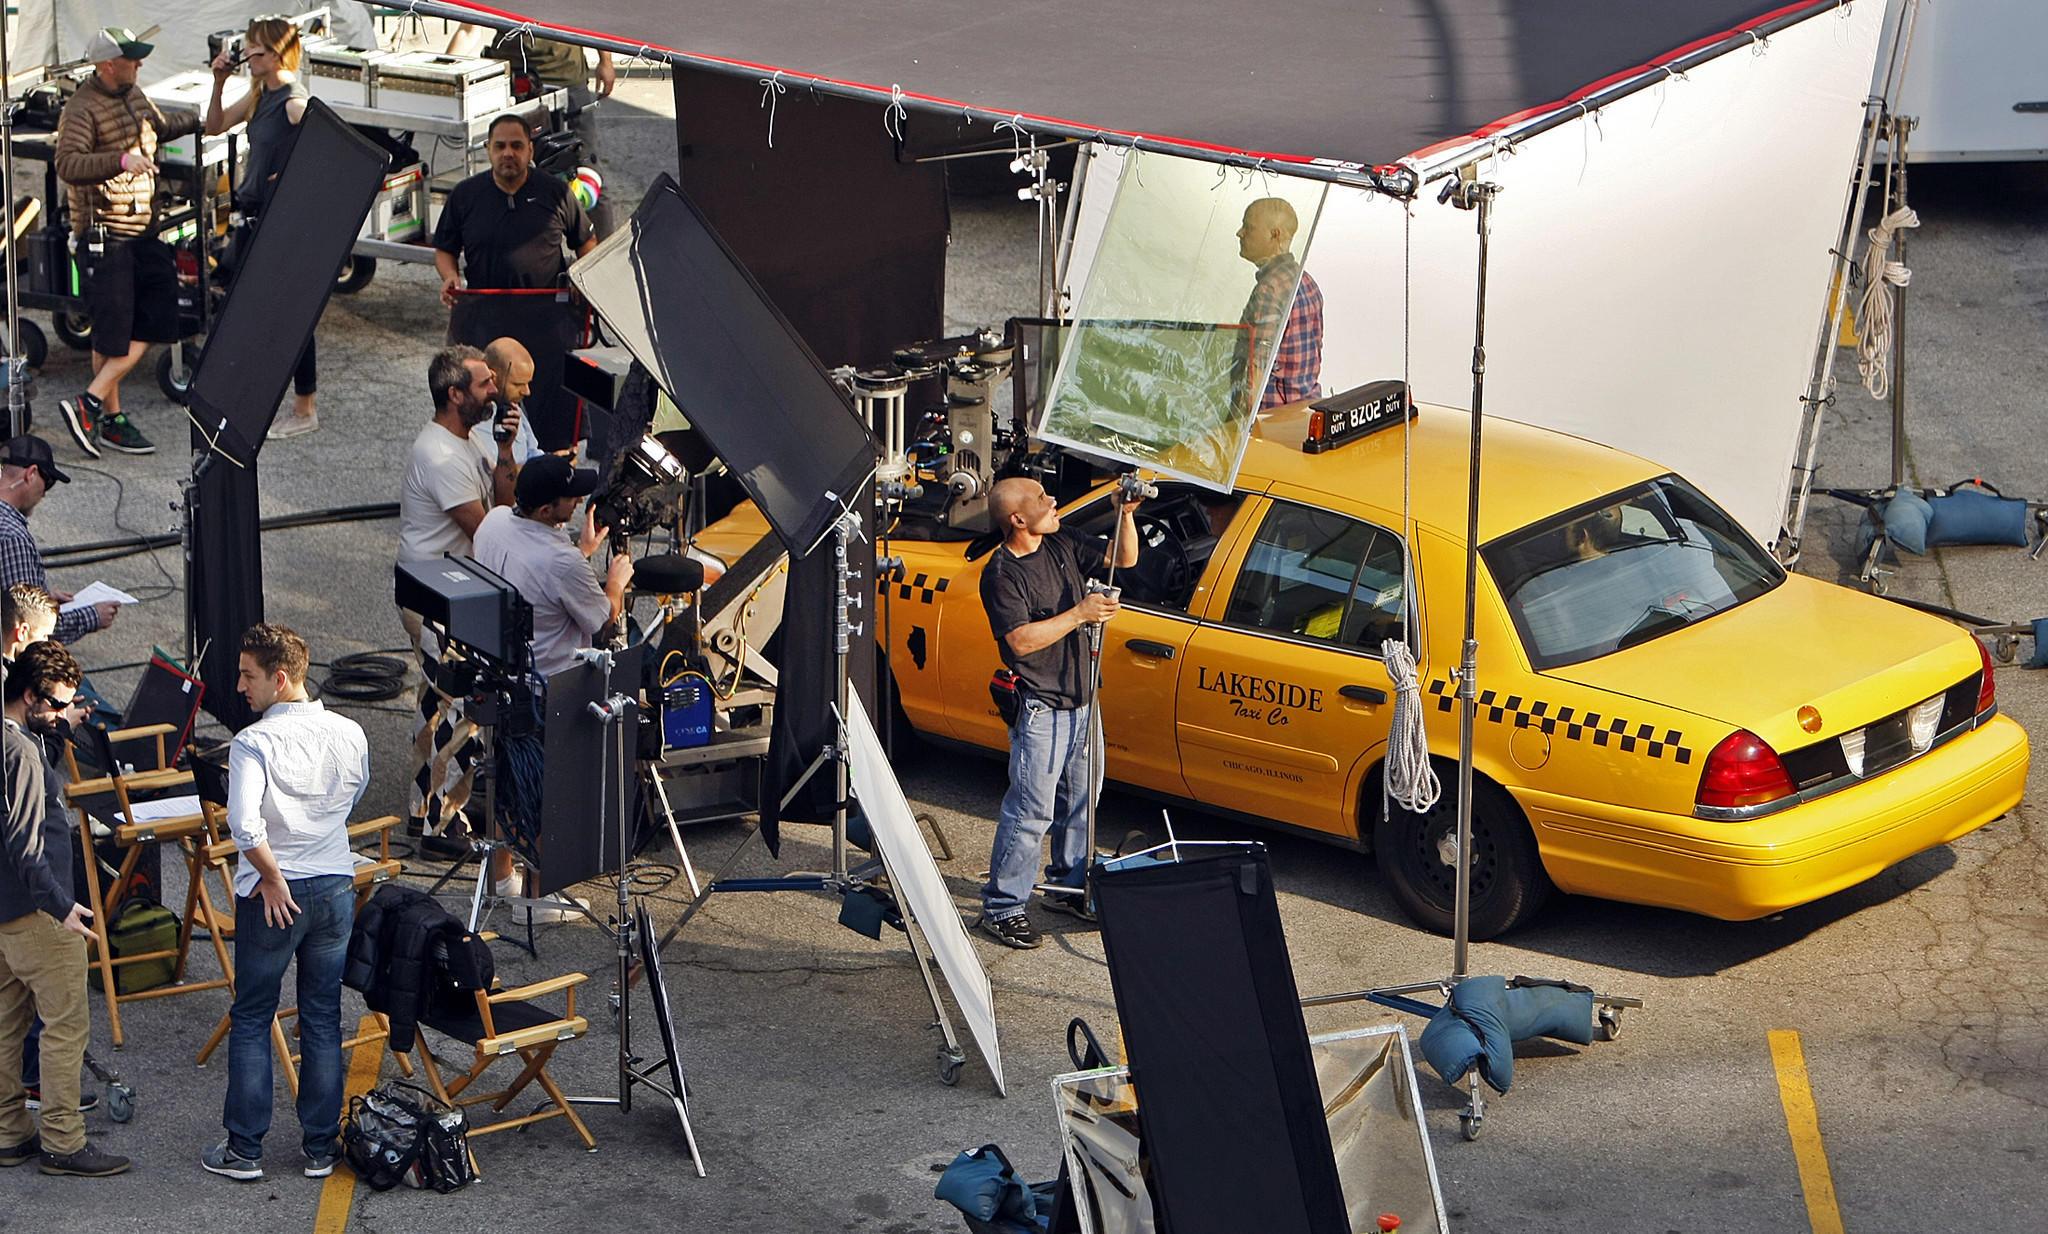 la featurefilm shoots jump in first quarter agency